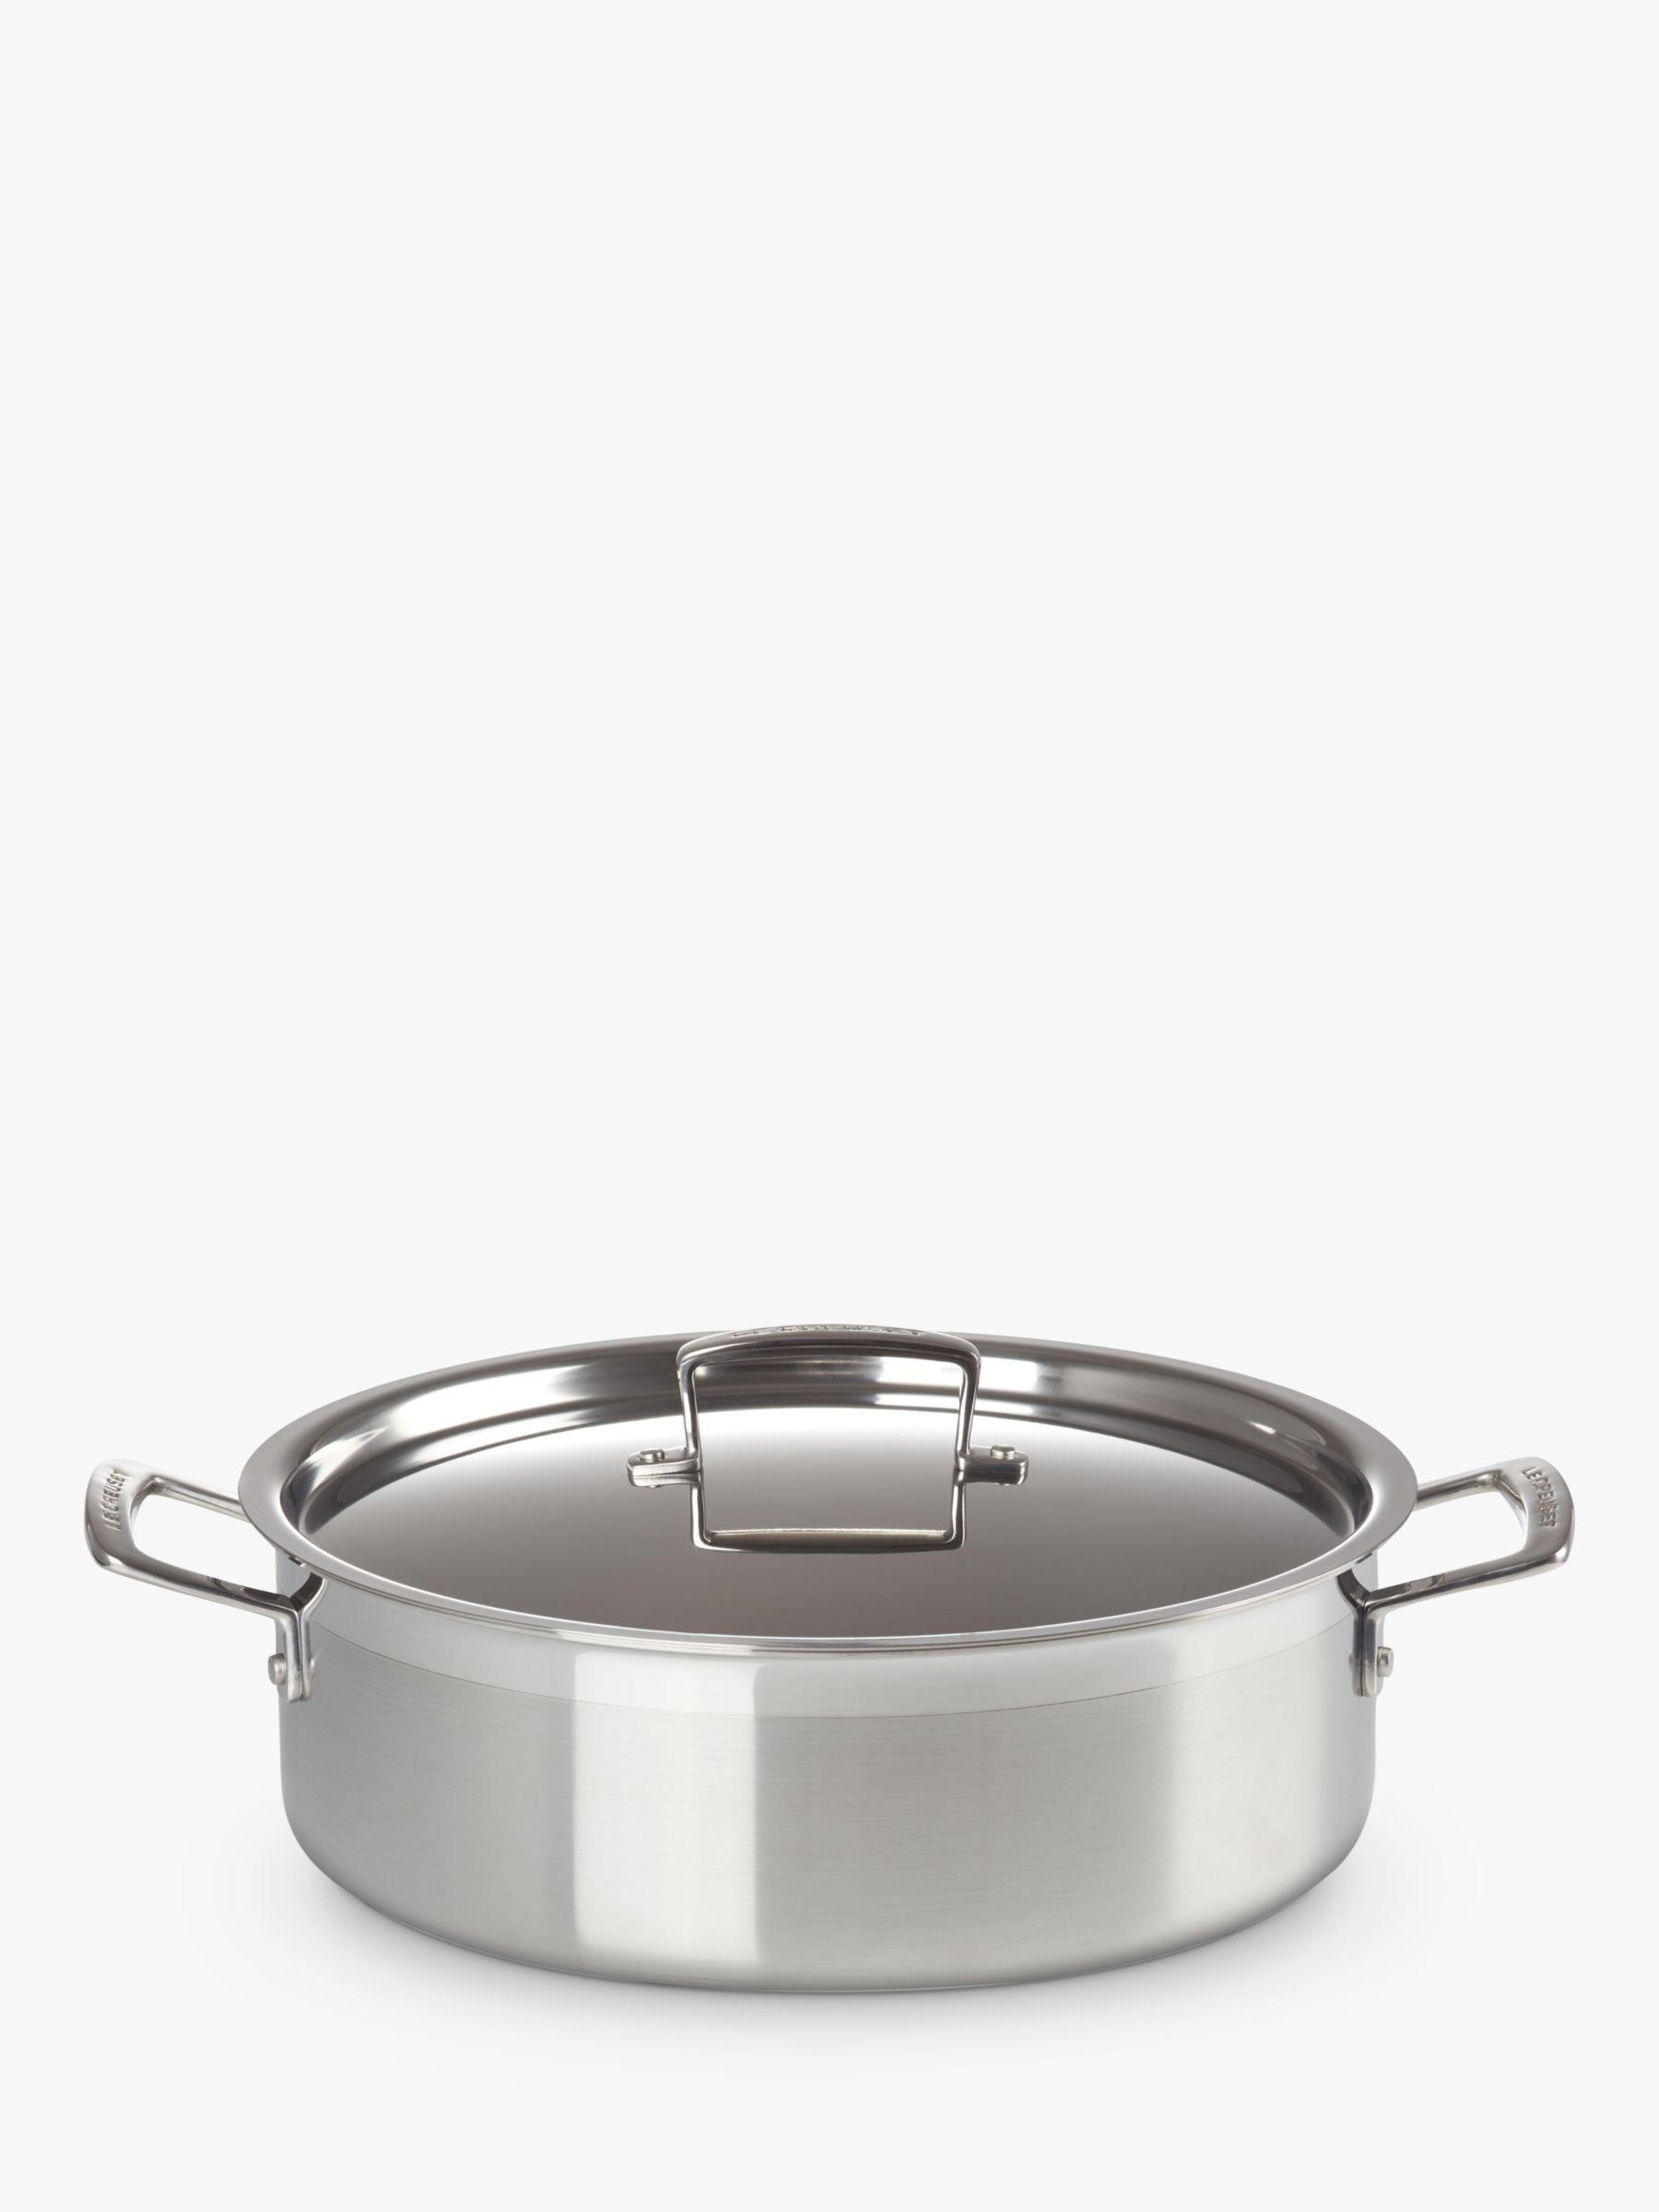 Le Creuset 3-Ply Stainless Steel Sauteuse Saute Pan, 28cm